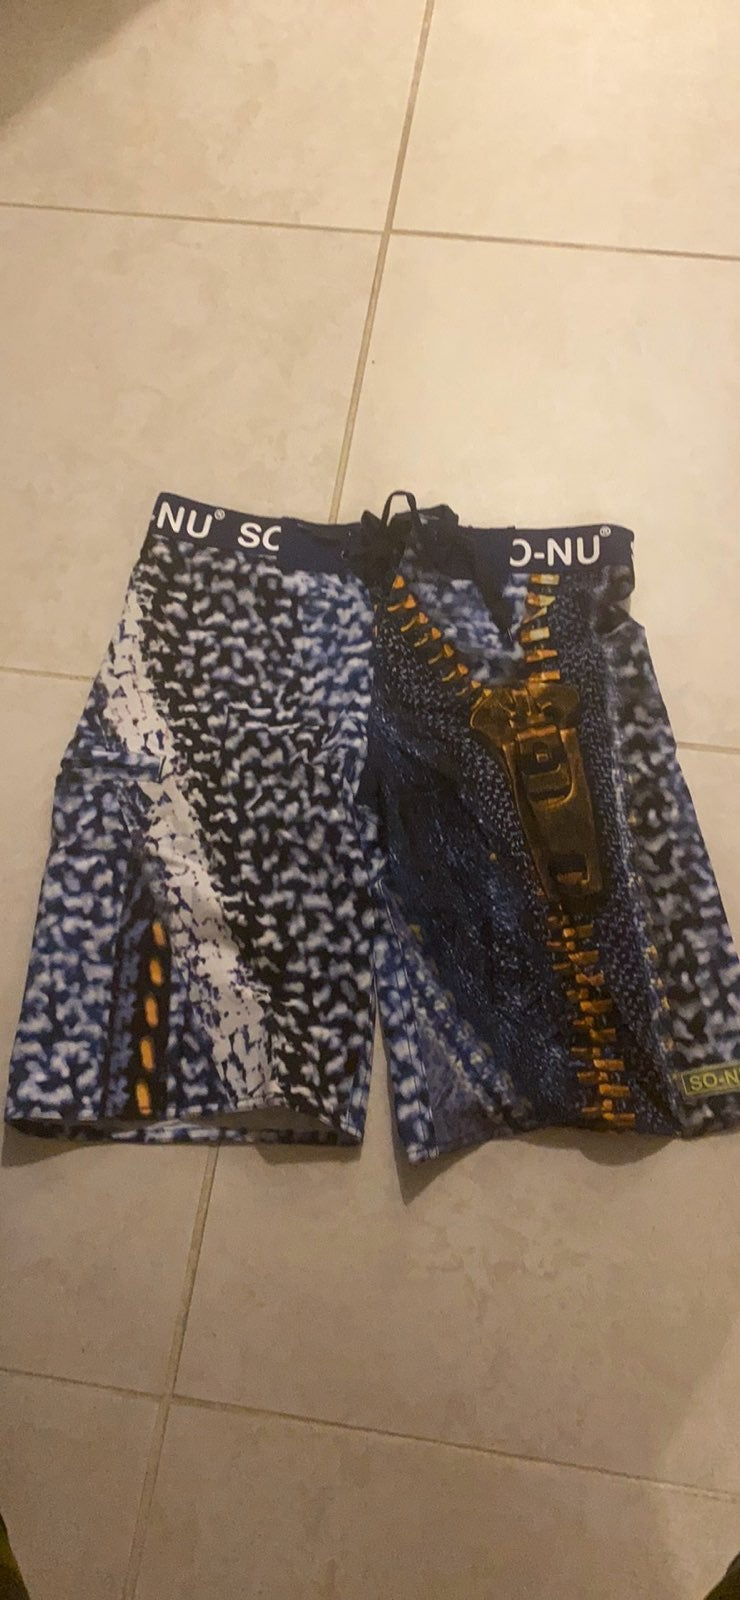 So-nu shorts size xs